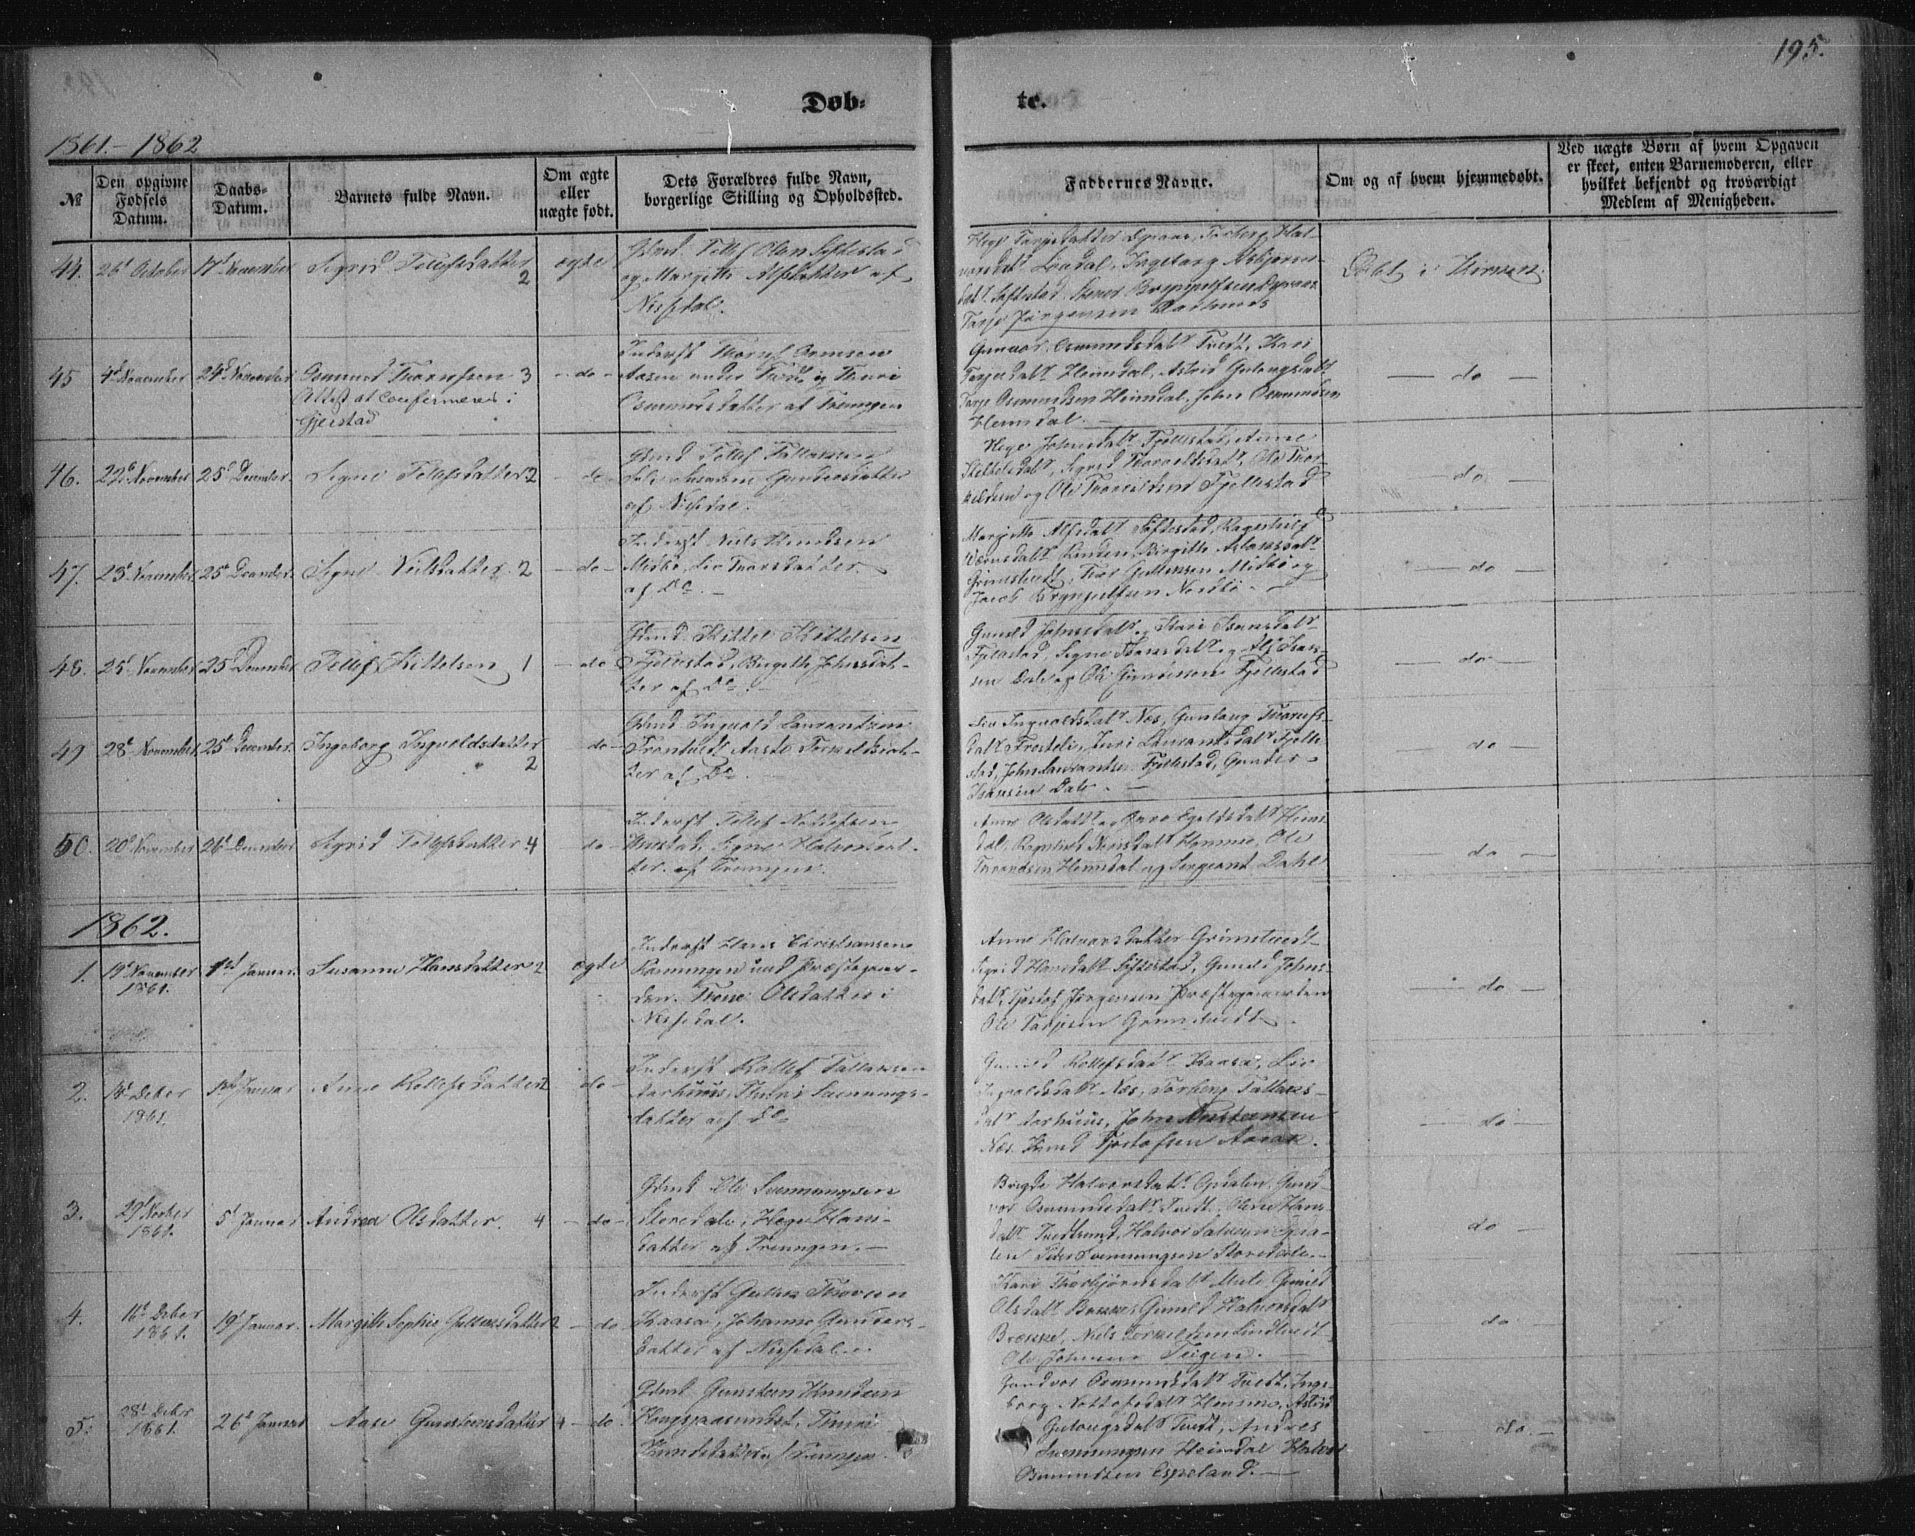 SAKO, Nissedal kirkebøker, F/Fa/L0003: Ministerialbok nr. I 3, 1846-1870, s. 194-195